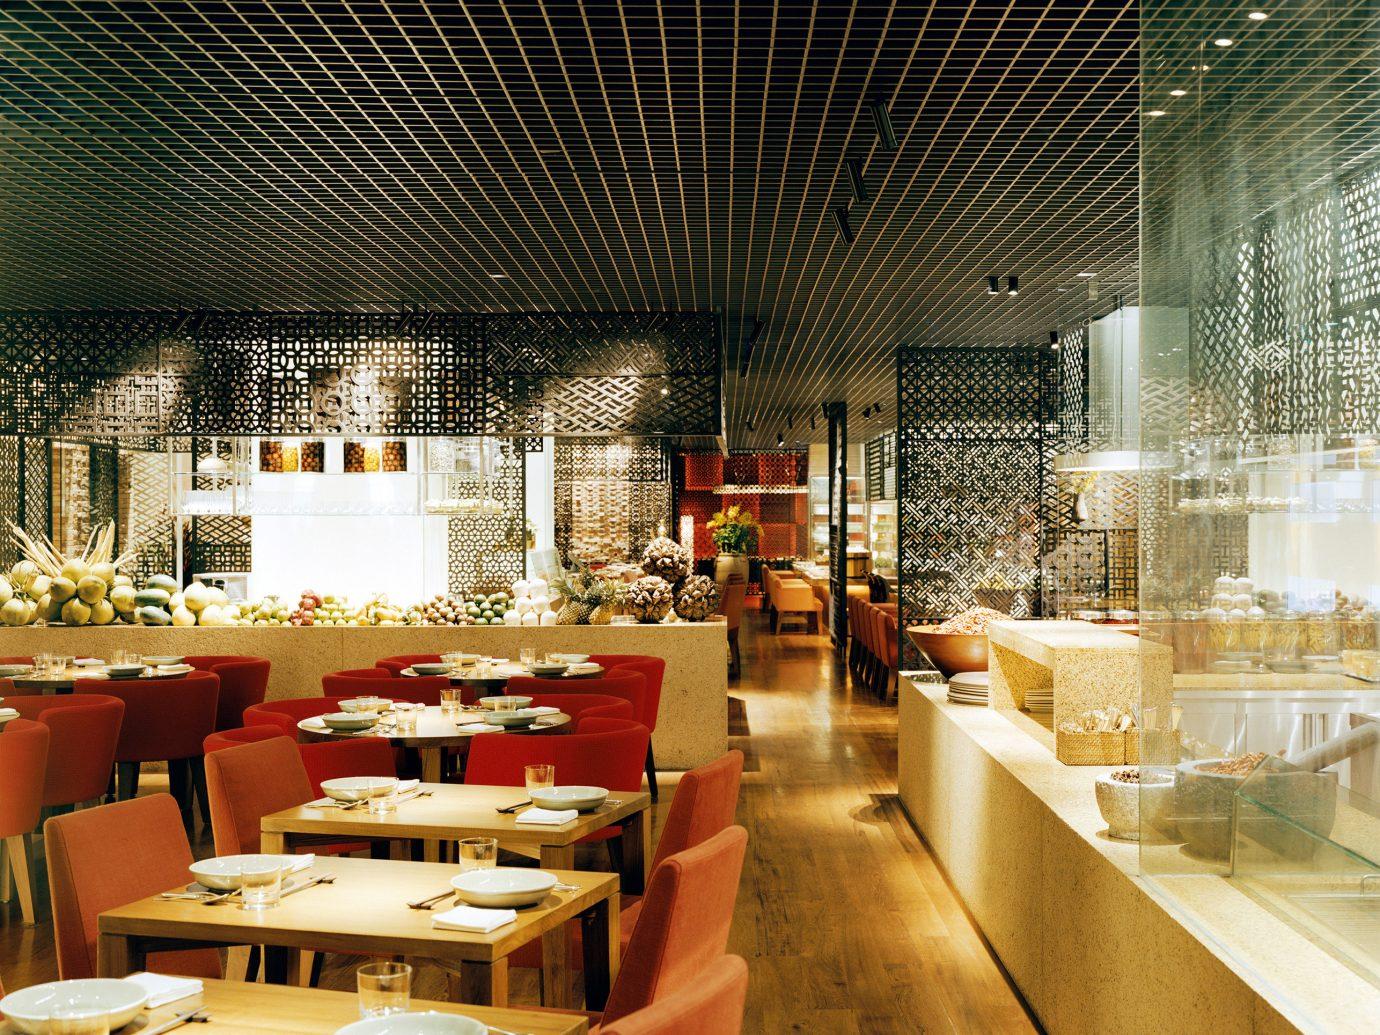 Dining Drink Eat Elegant Food + Drink Lounge Modern table indoor floor chair Lobby restaurant interior design meal Design furniture dining room